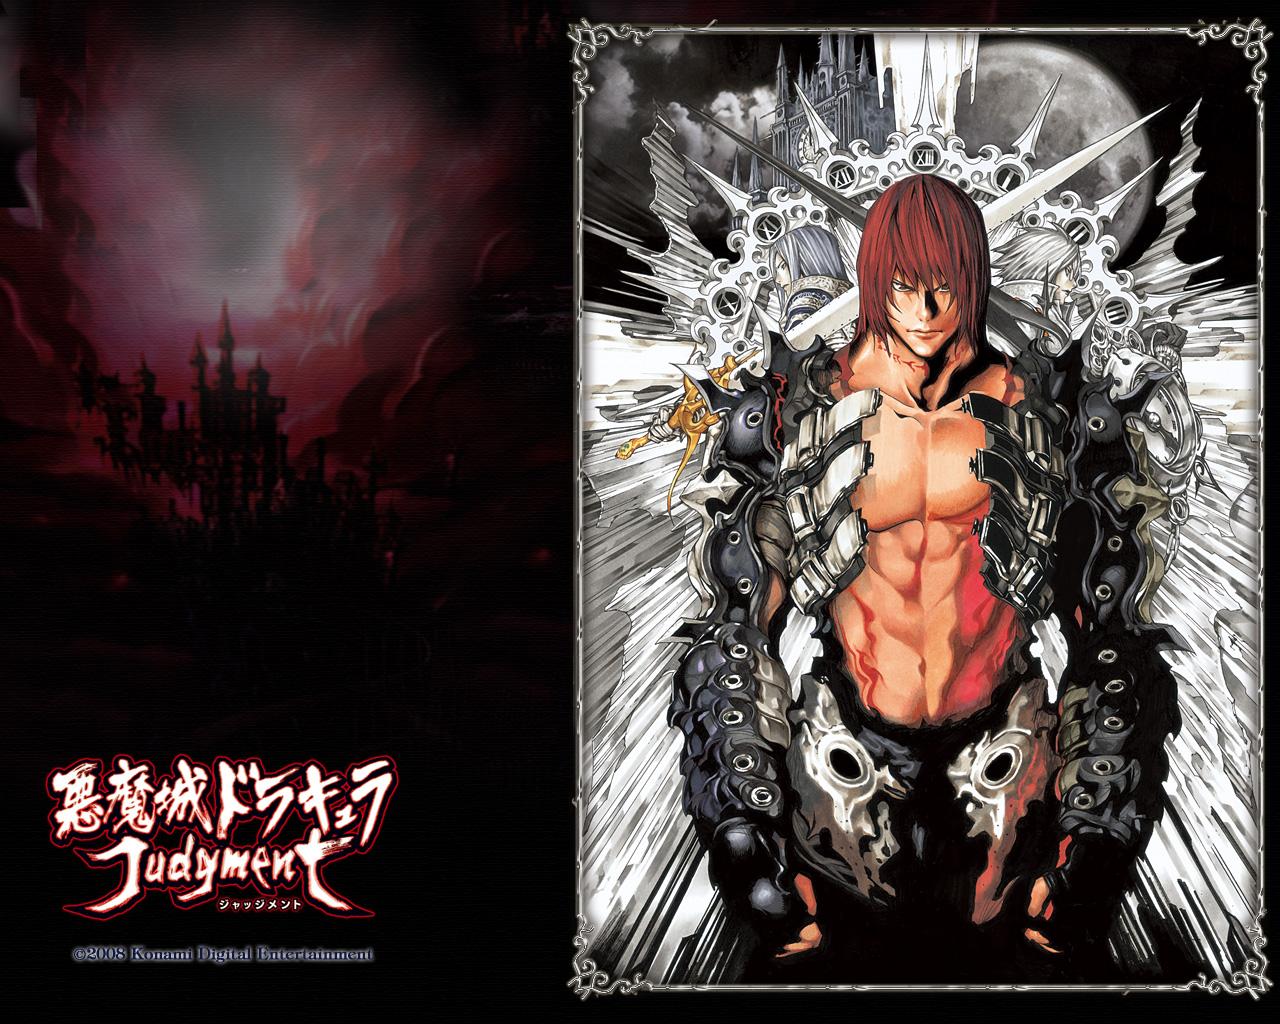 Castlevania Judgment Download Image